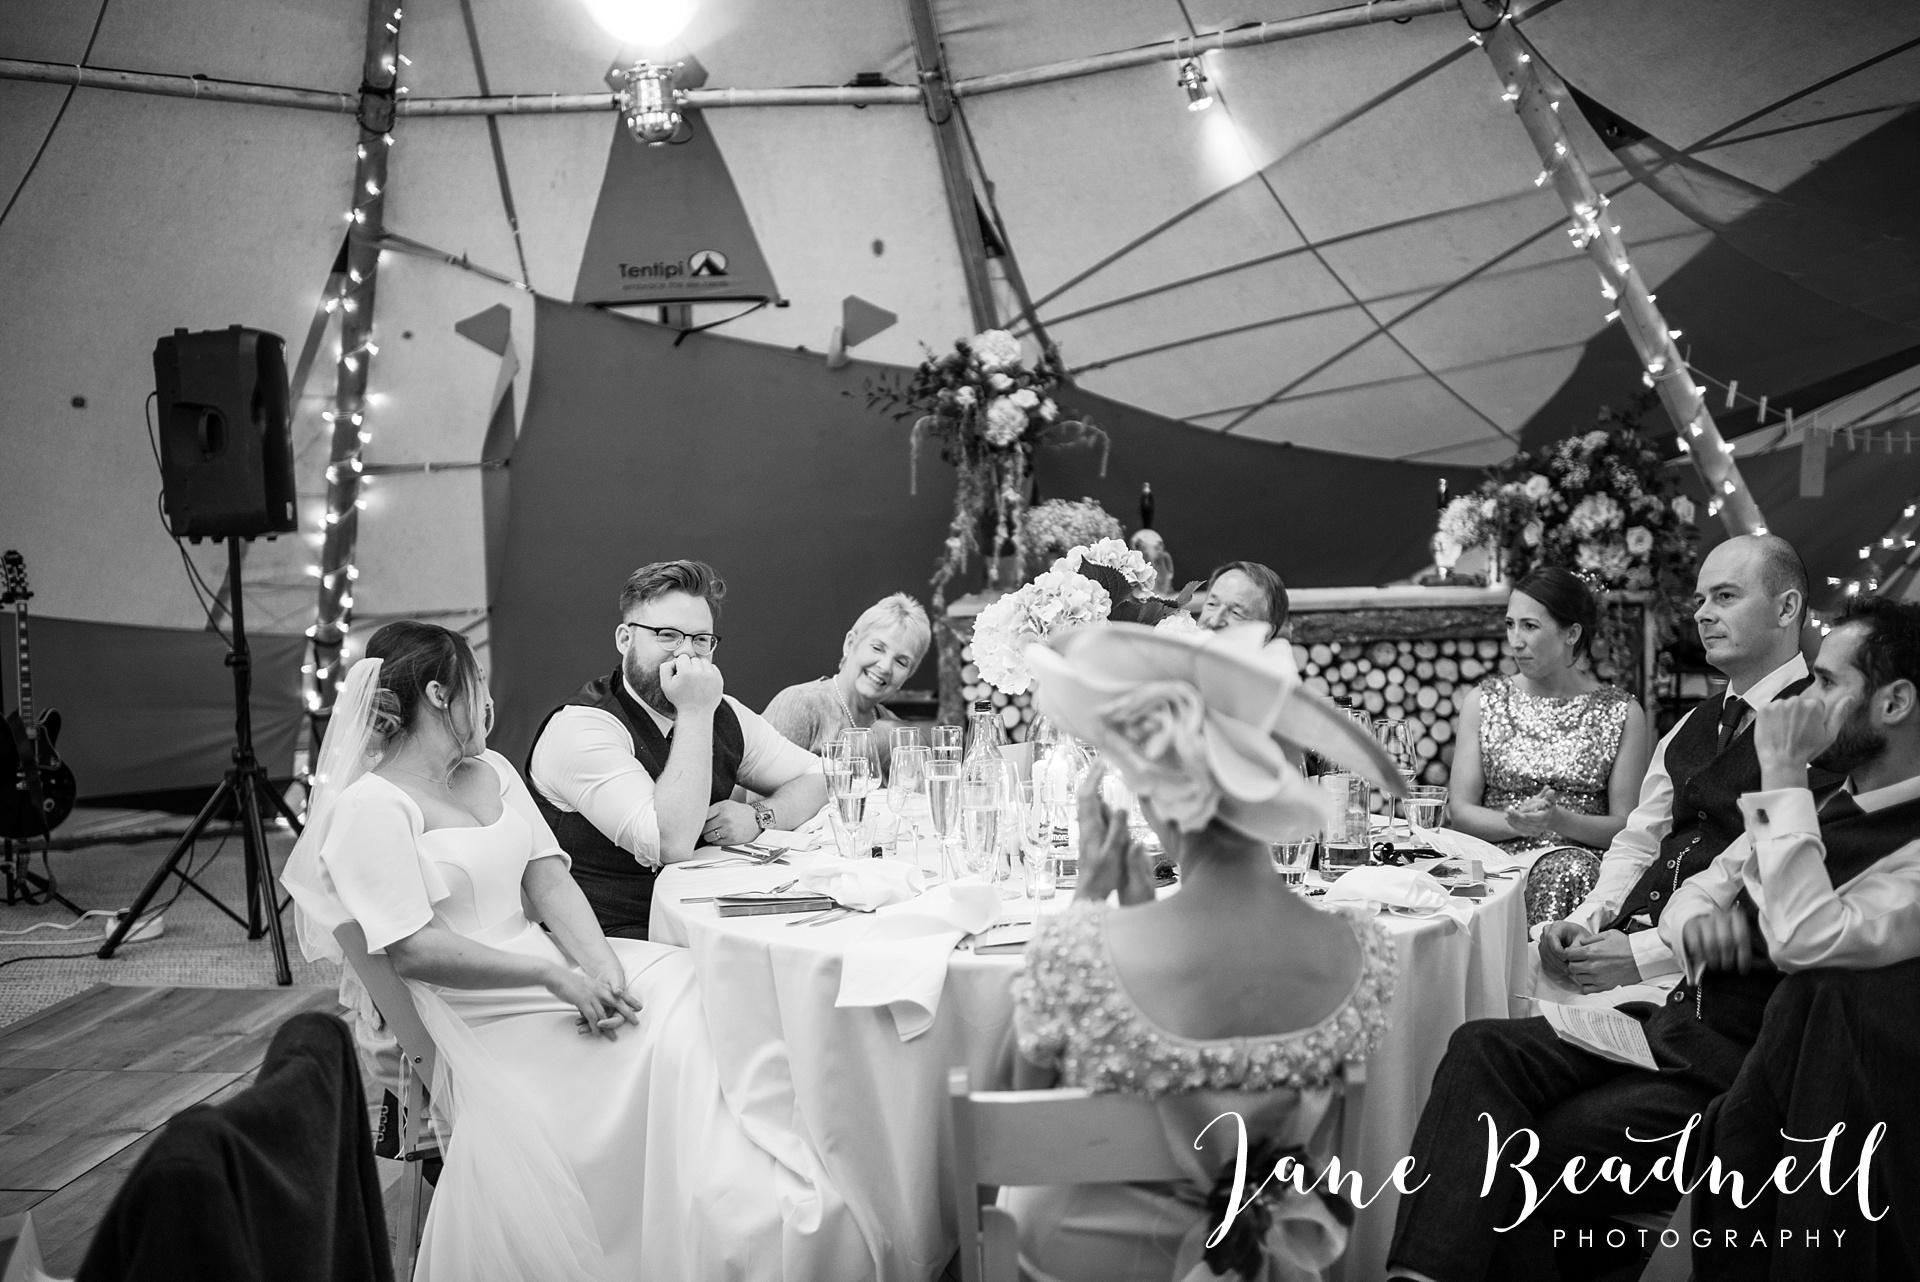 fine-art-wedding-photographer-jane-beadnell-yorkshire-wedding-photographer_0138